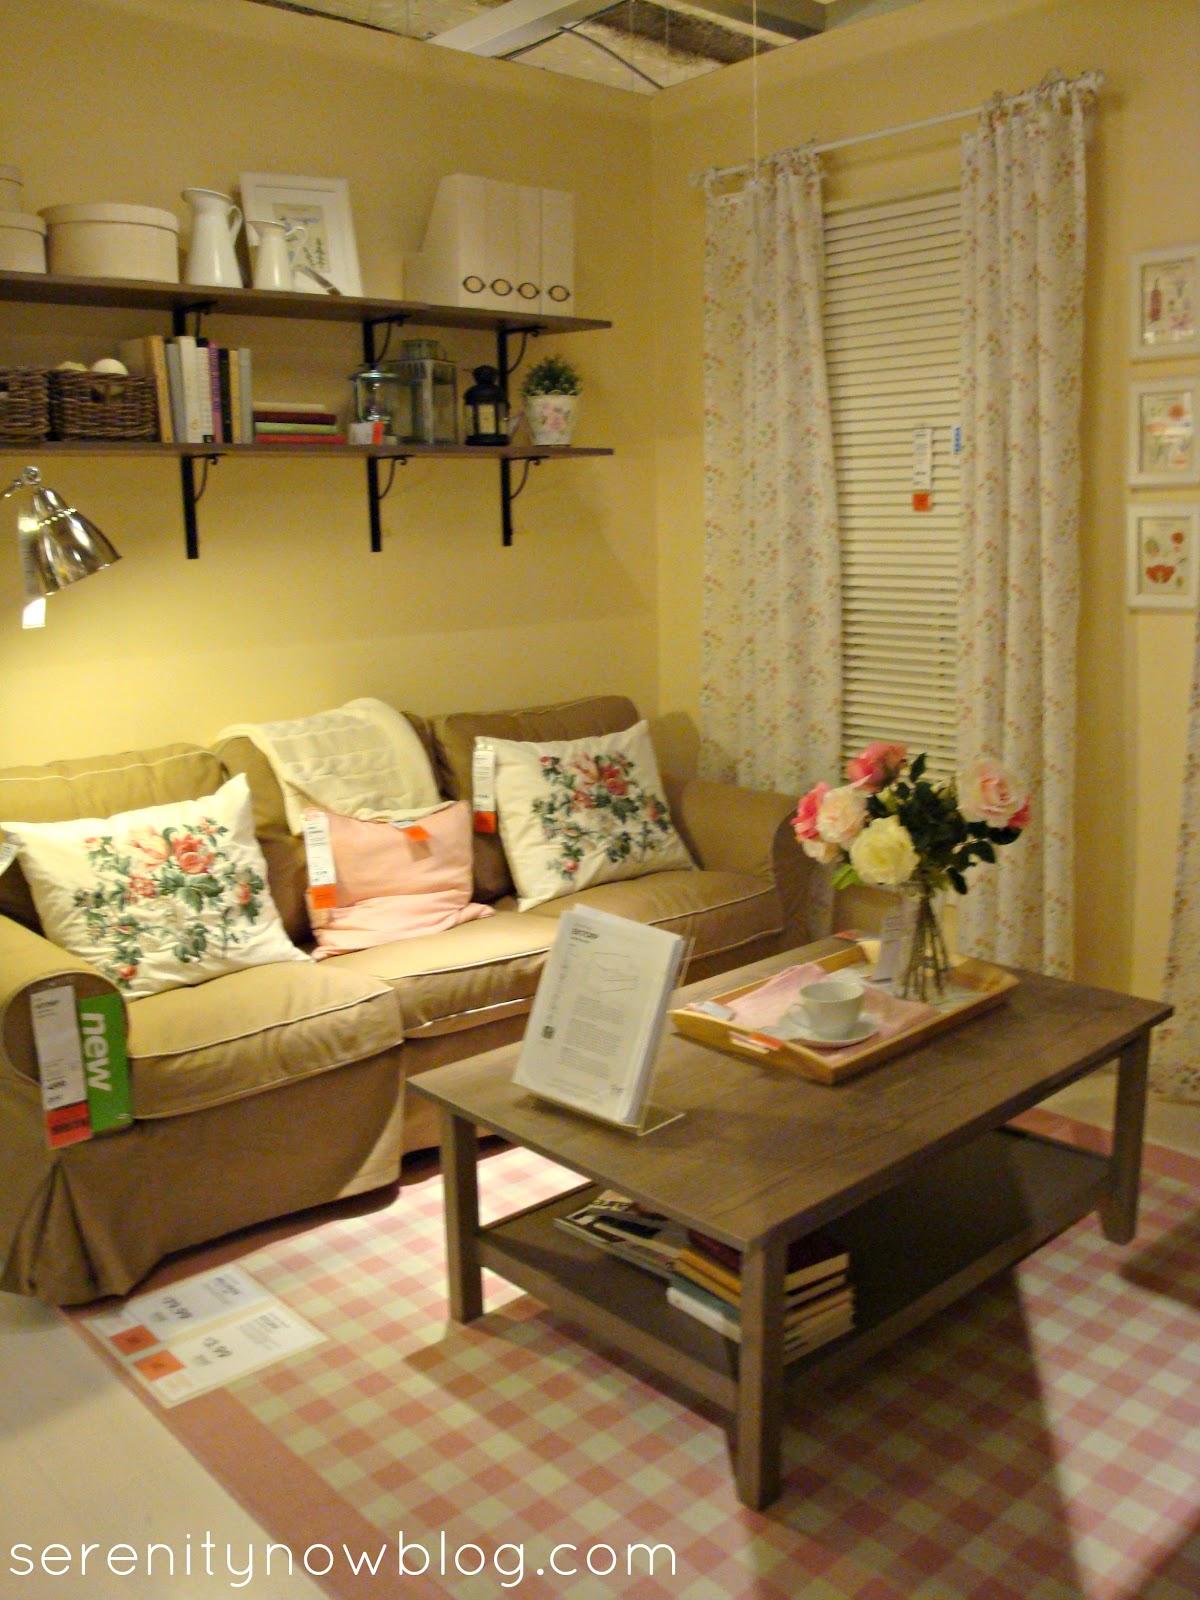 Wondrous Den Bedroom Decorating Ideas Bedroom Style Ideas Largest Home Design Picture Inspirations Pitcheantrous